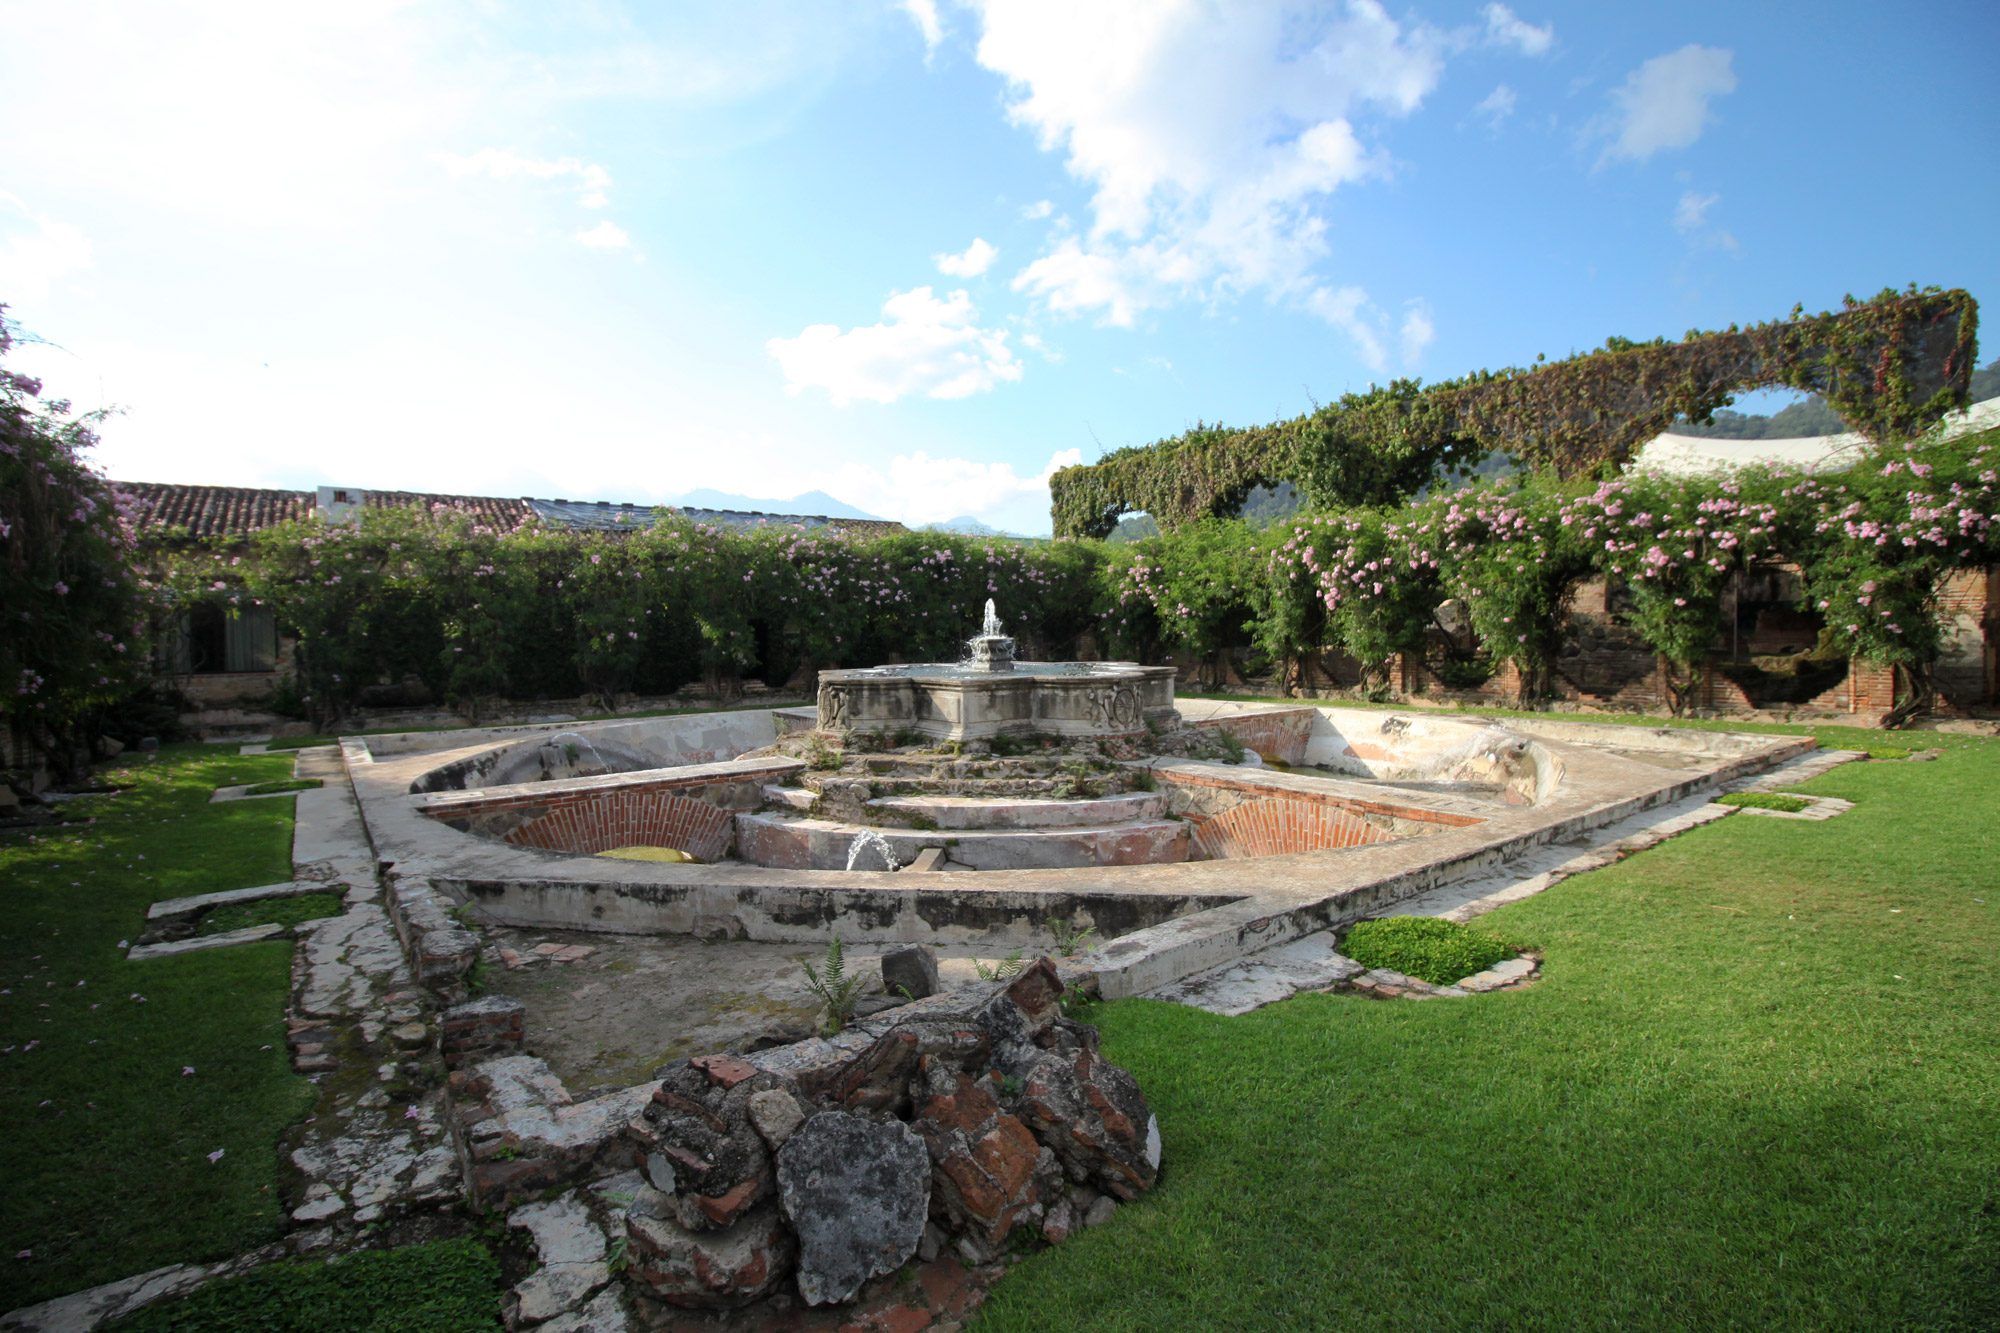 Guatemala 2015 - dag 3 - Casa Santa Domingo in Antigua